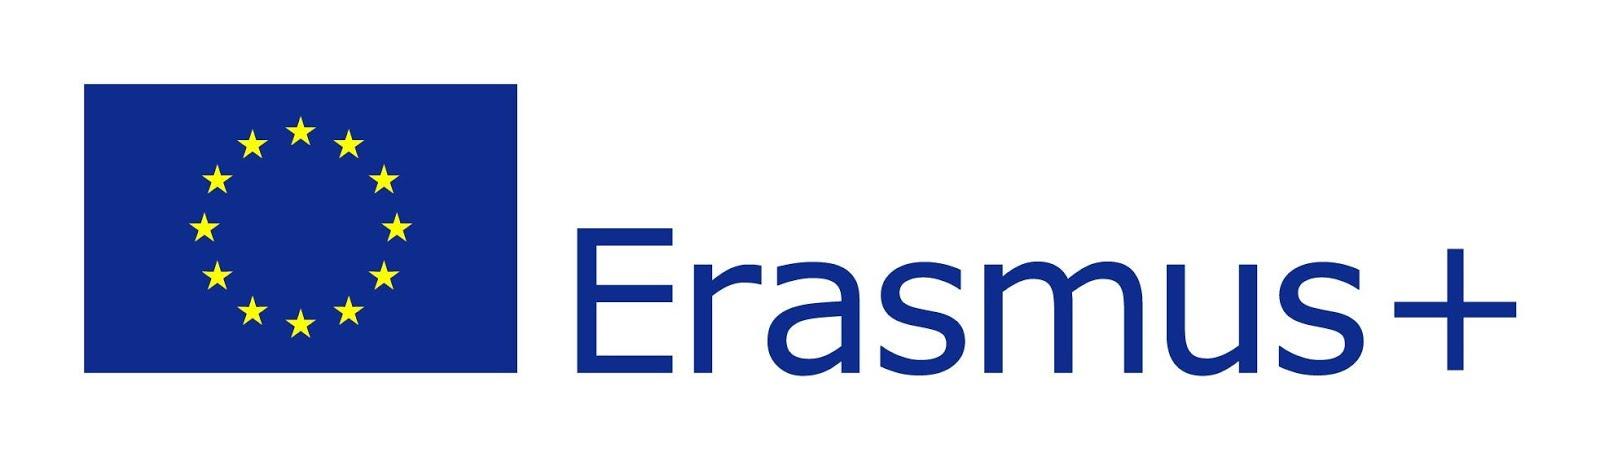 PROGRAMA ERASMUS + UNIÃO EUROPEIA